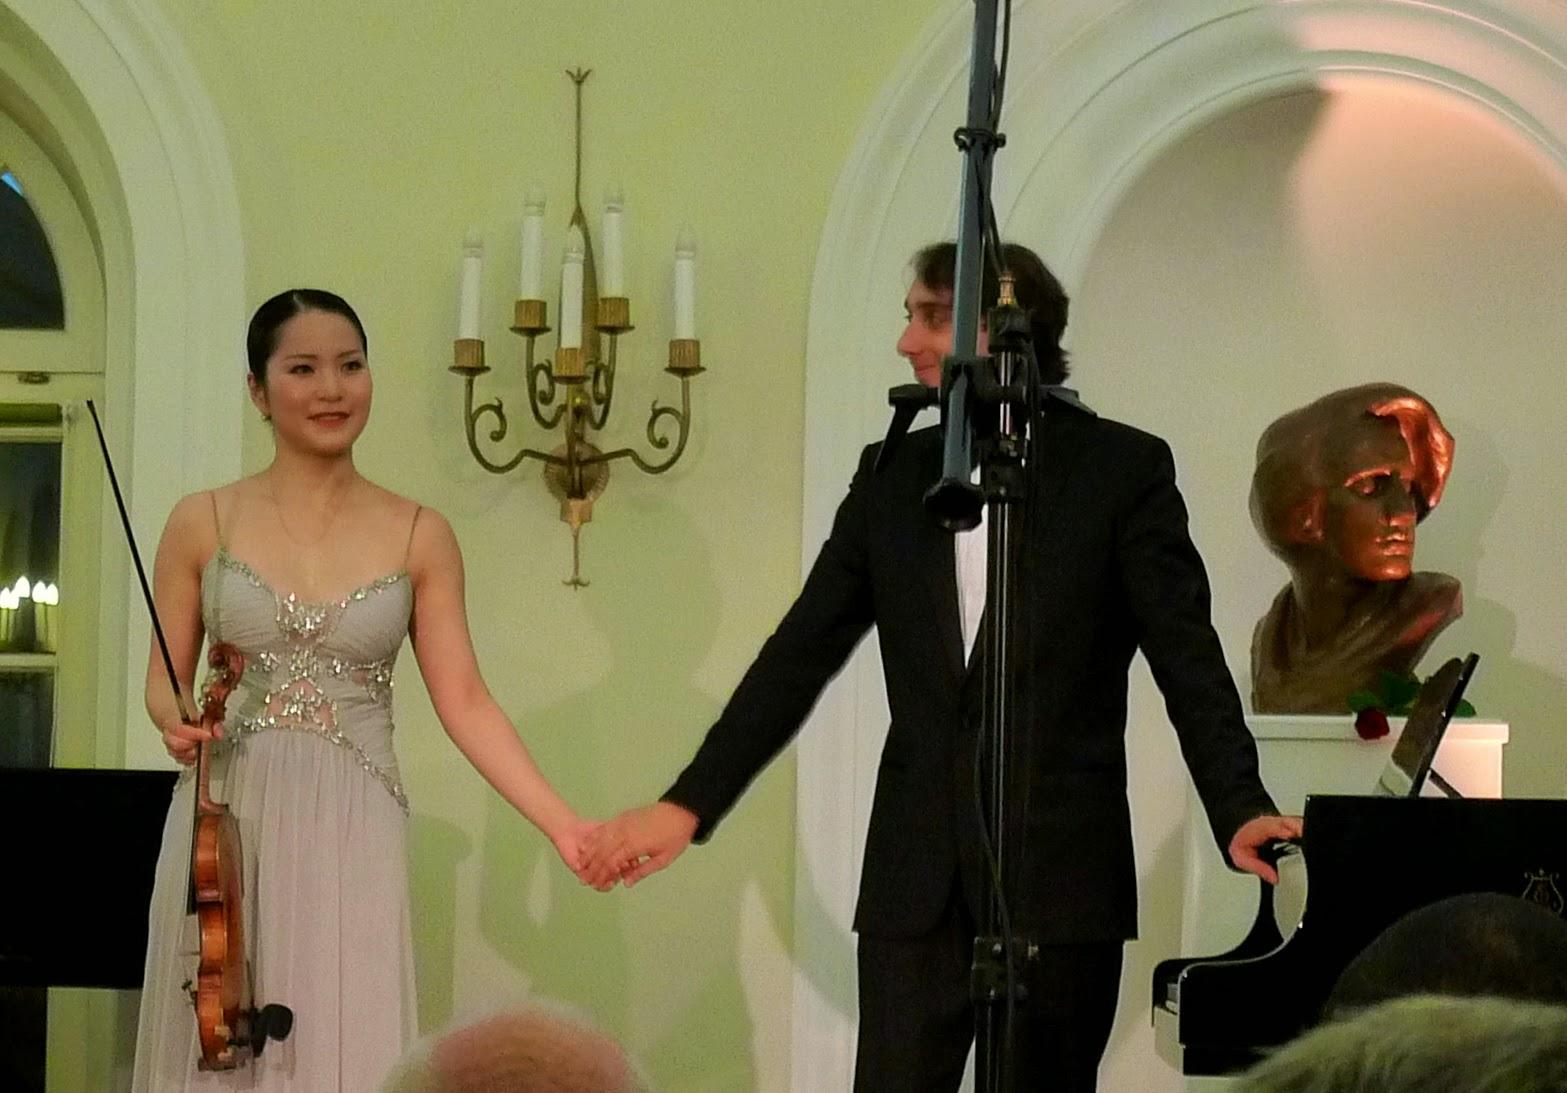 69th Duszniki-Zdroj Chopin Festival August 1-9 2014